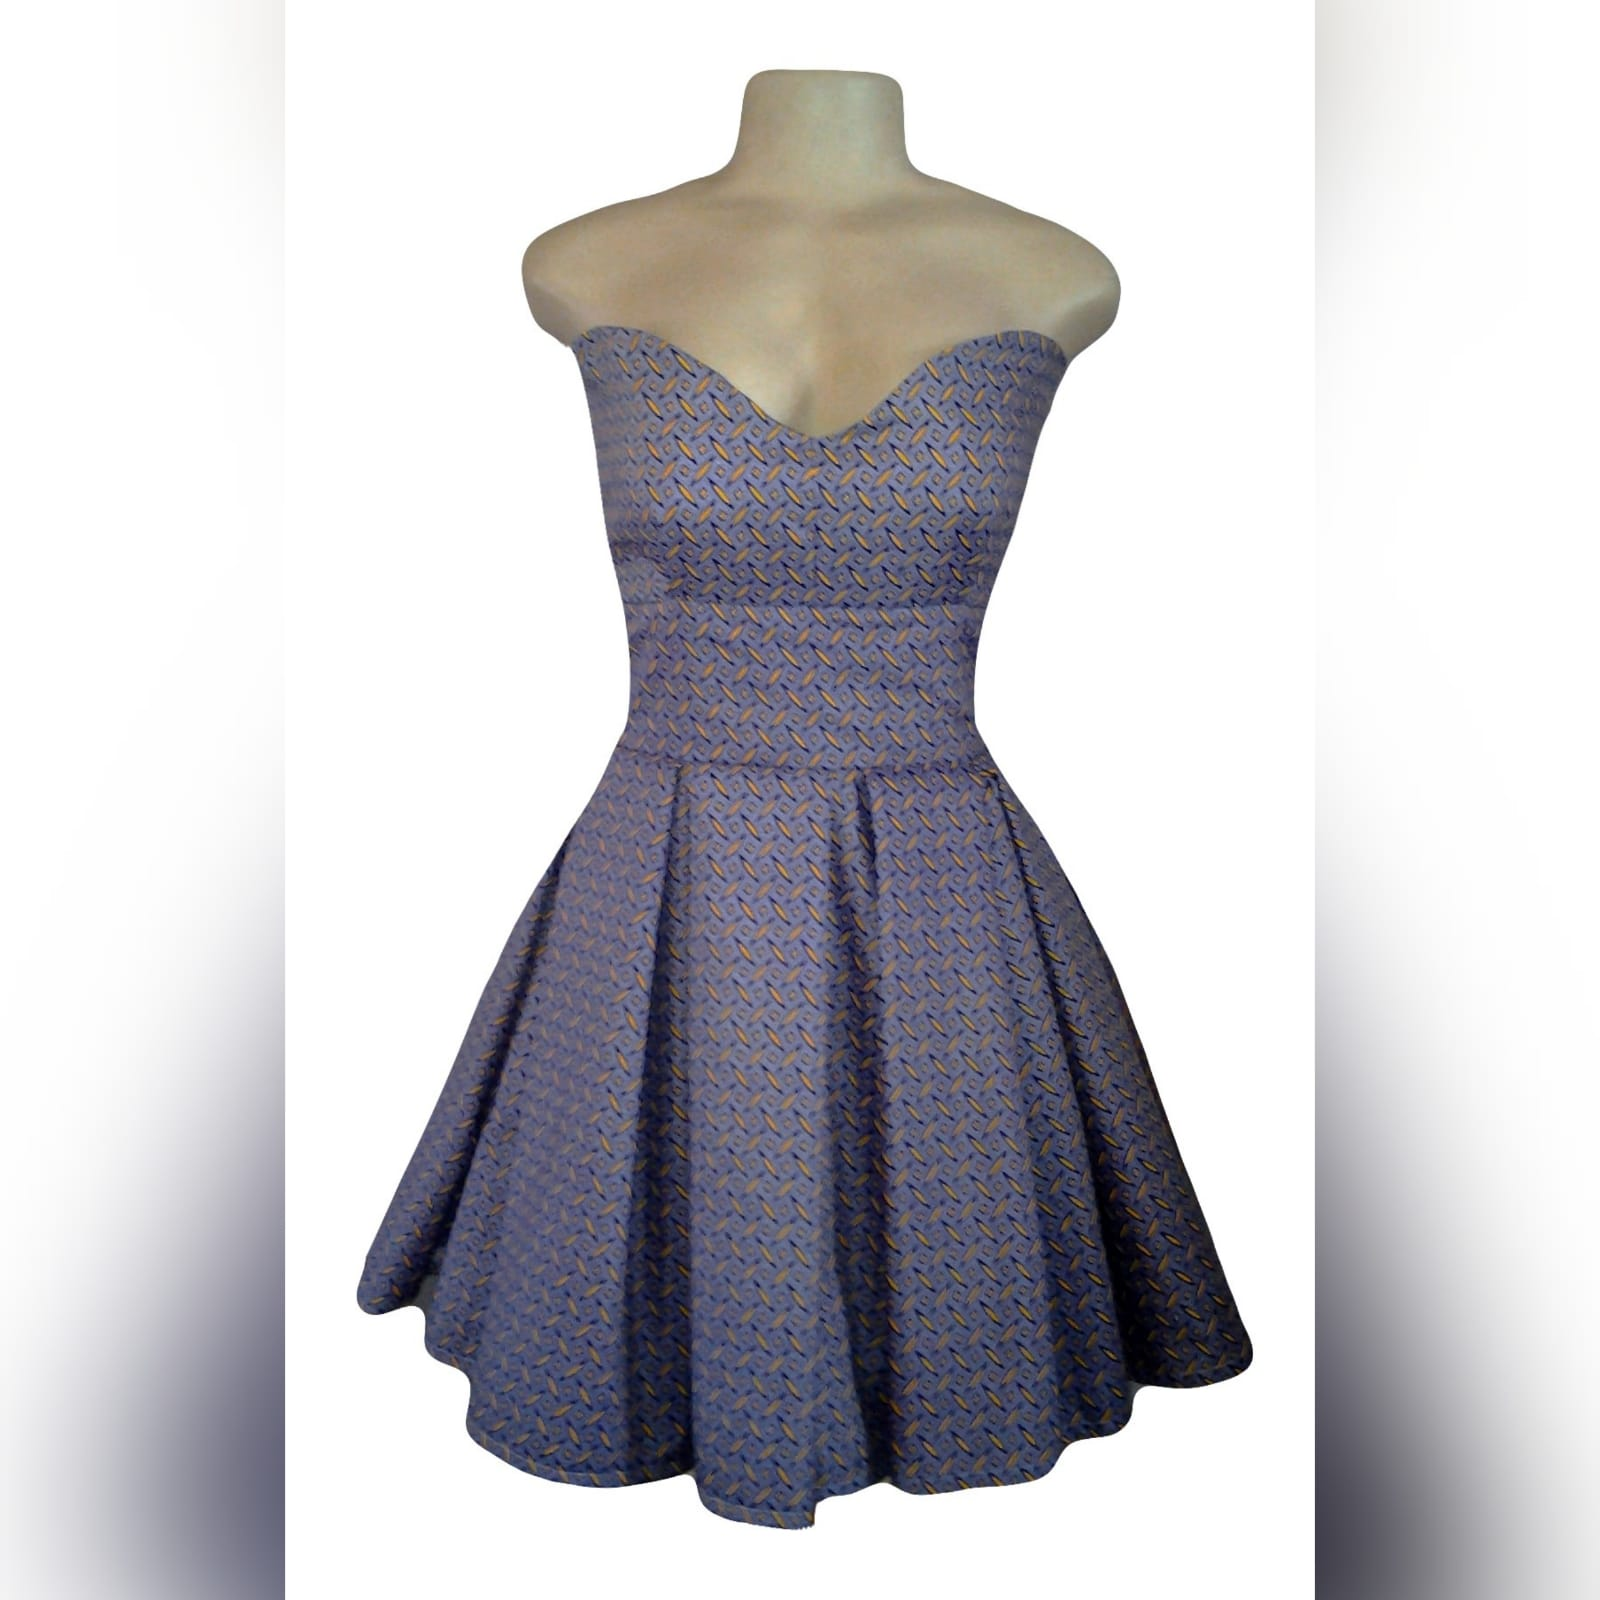 Modern purple traditional shweshwe dress 1 shweshwe traditional boob tube dress with a curvy sweetheart neckline and pleated bottom.